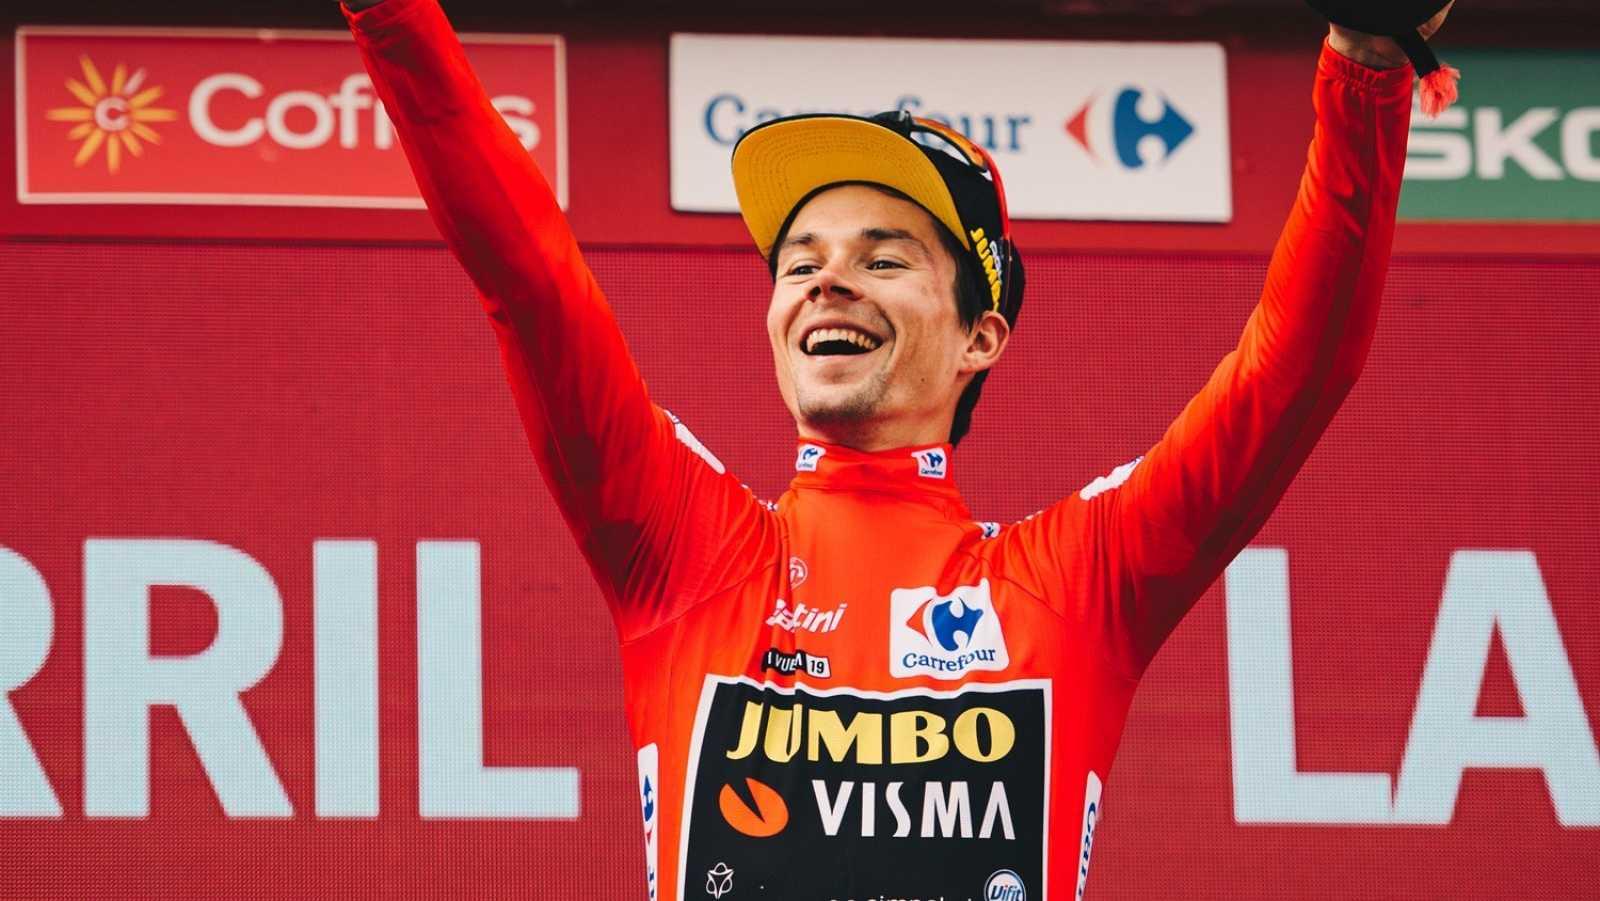 Roglic celebra su triunfo en la Vuelta 2020